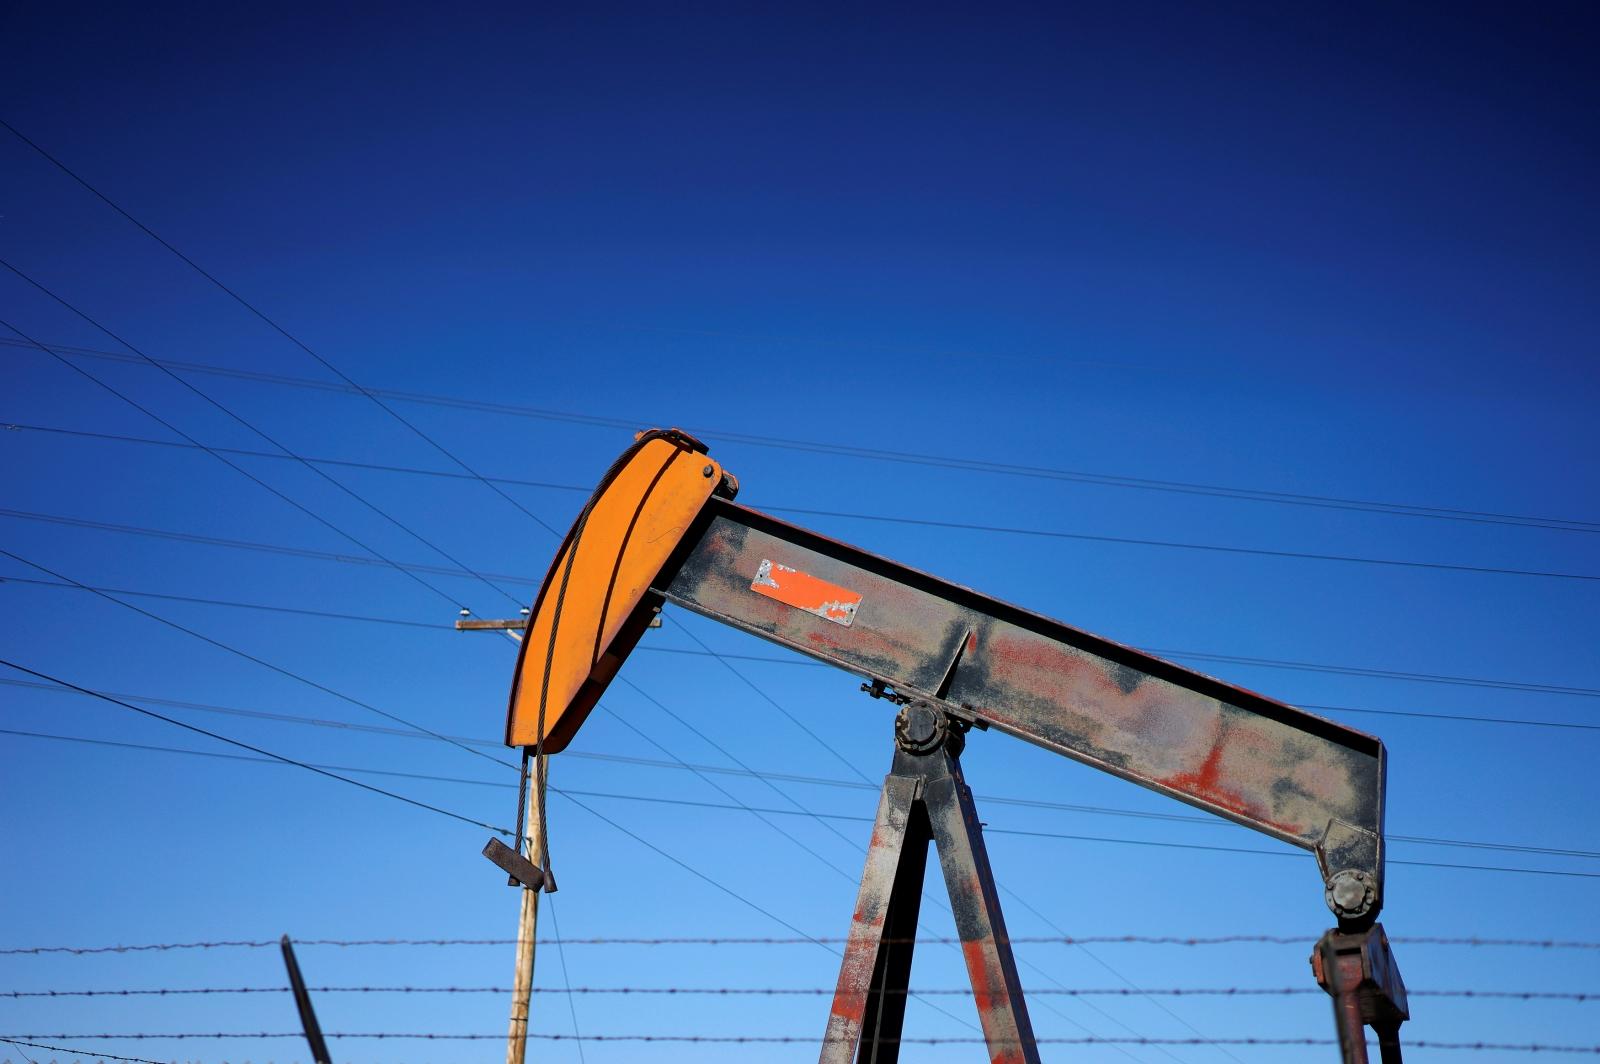 OIL-POLL